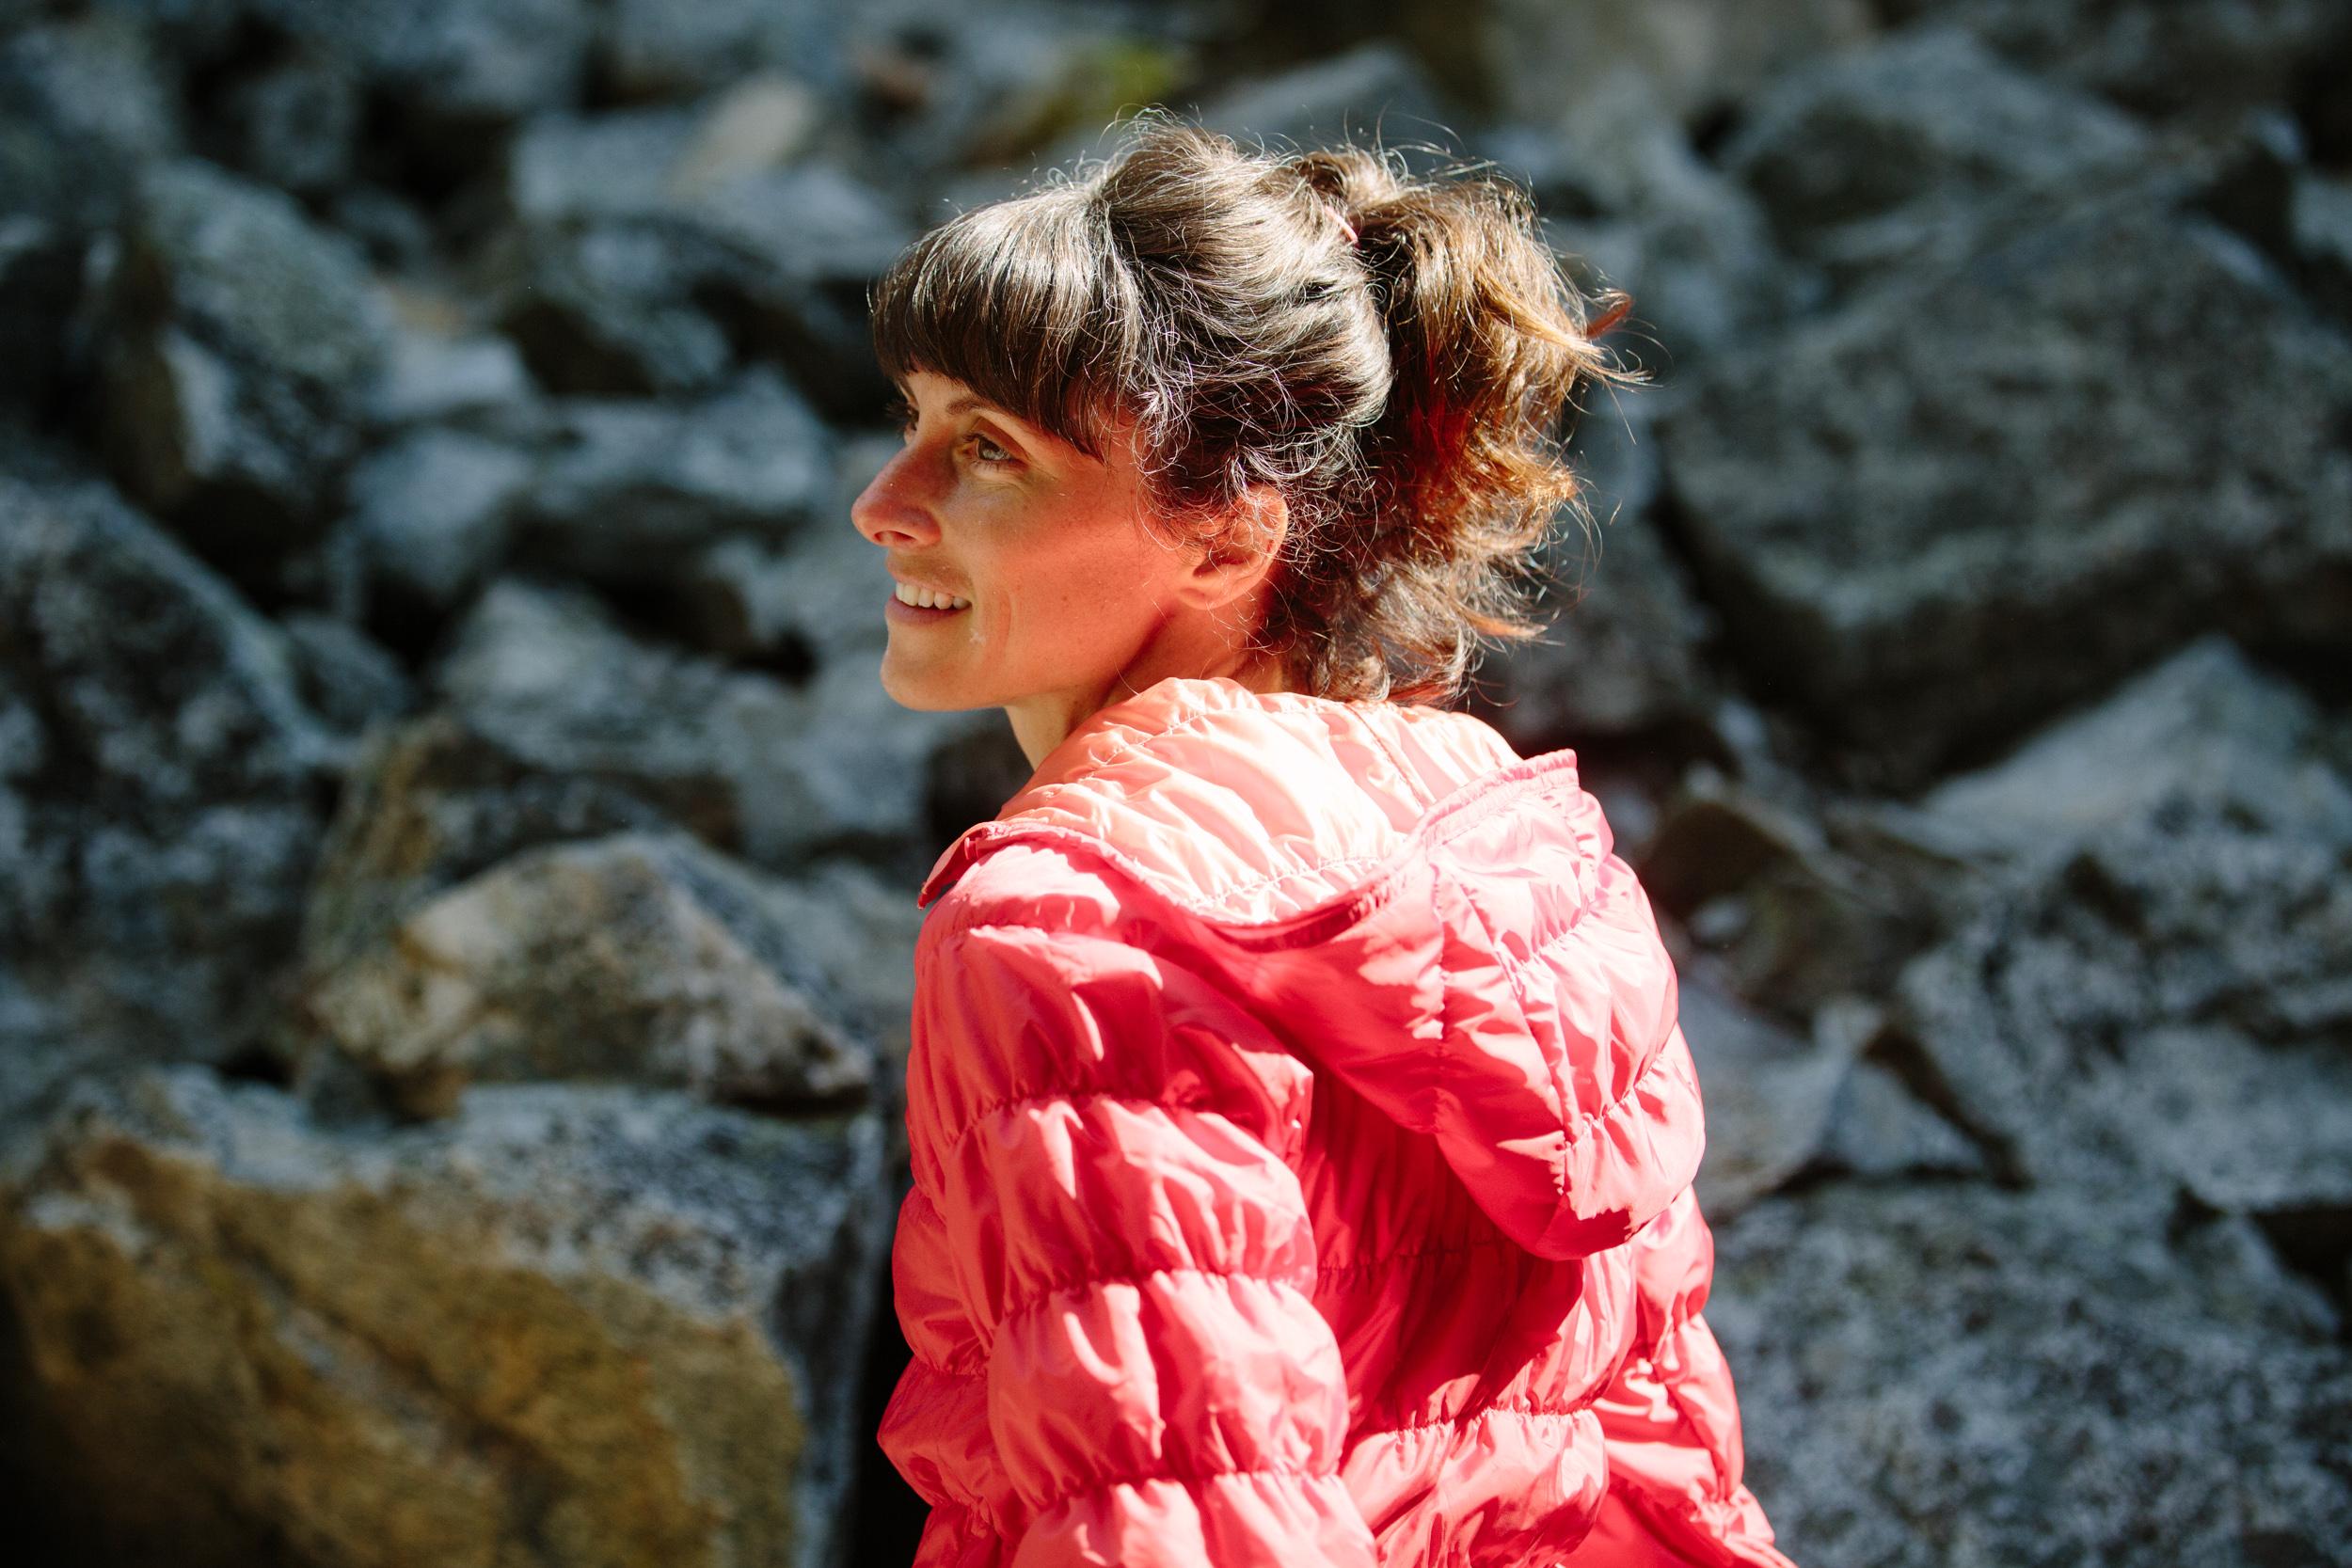 30robb-thompson-skaha-climbing-sarah-leanne-hart-.jpg